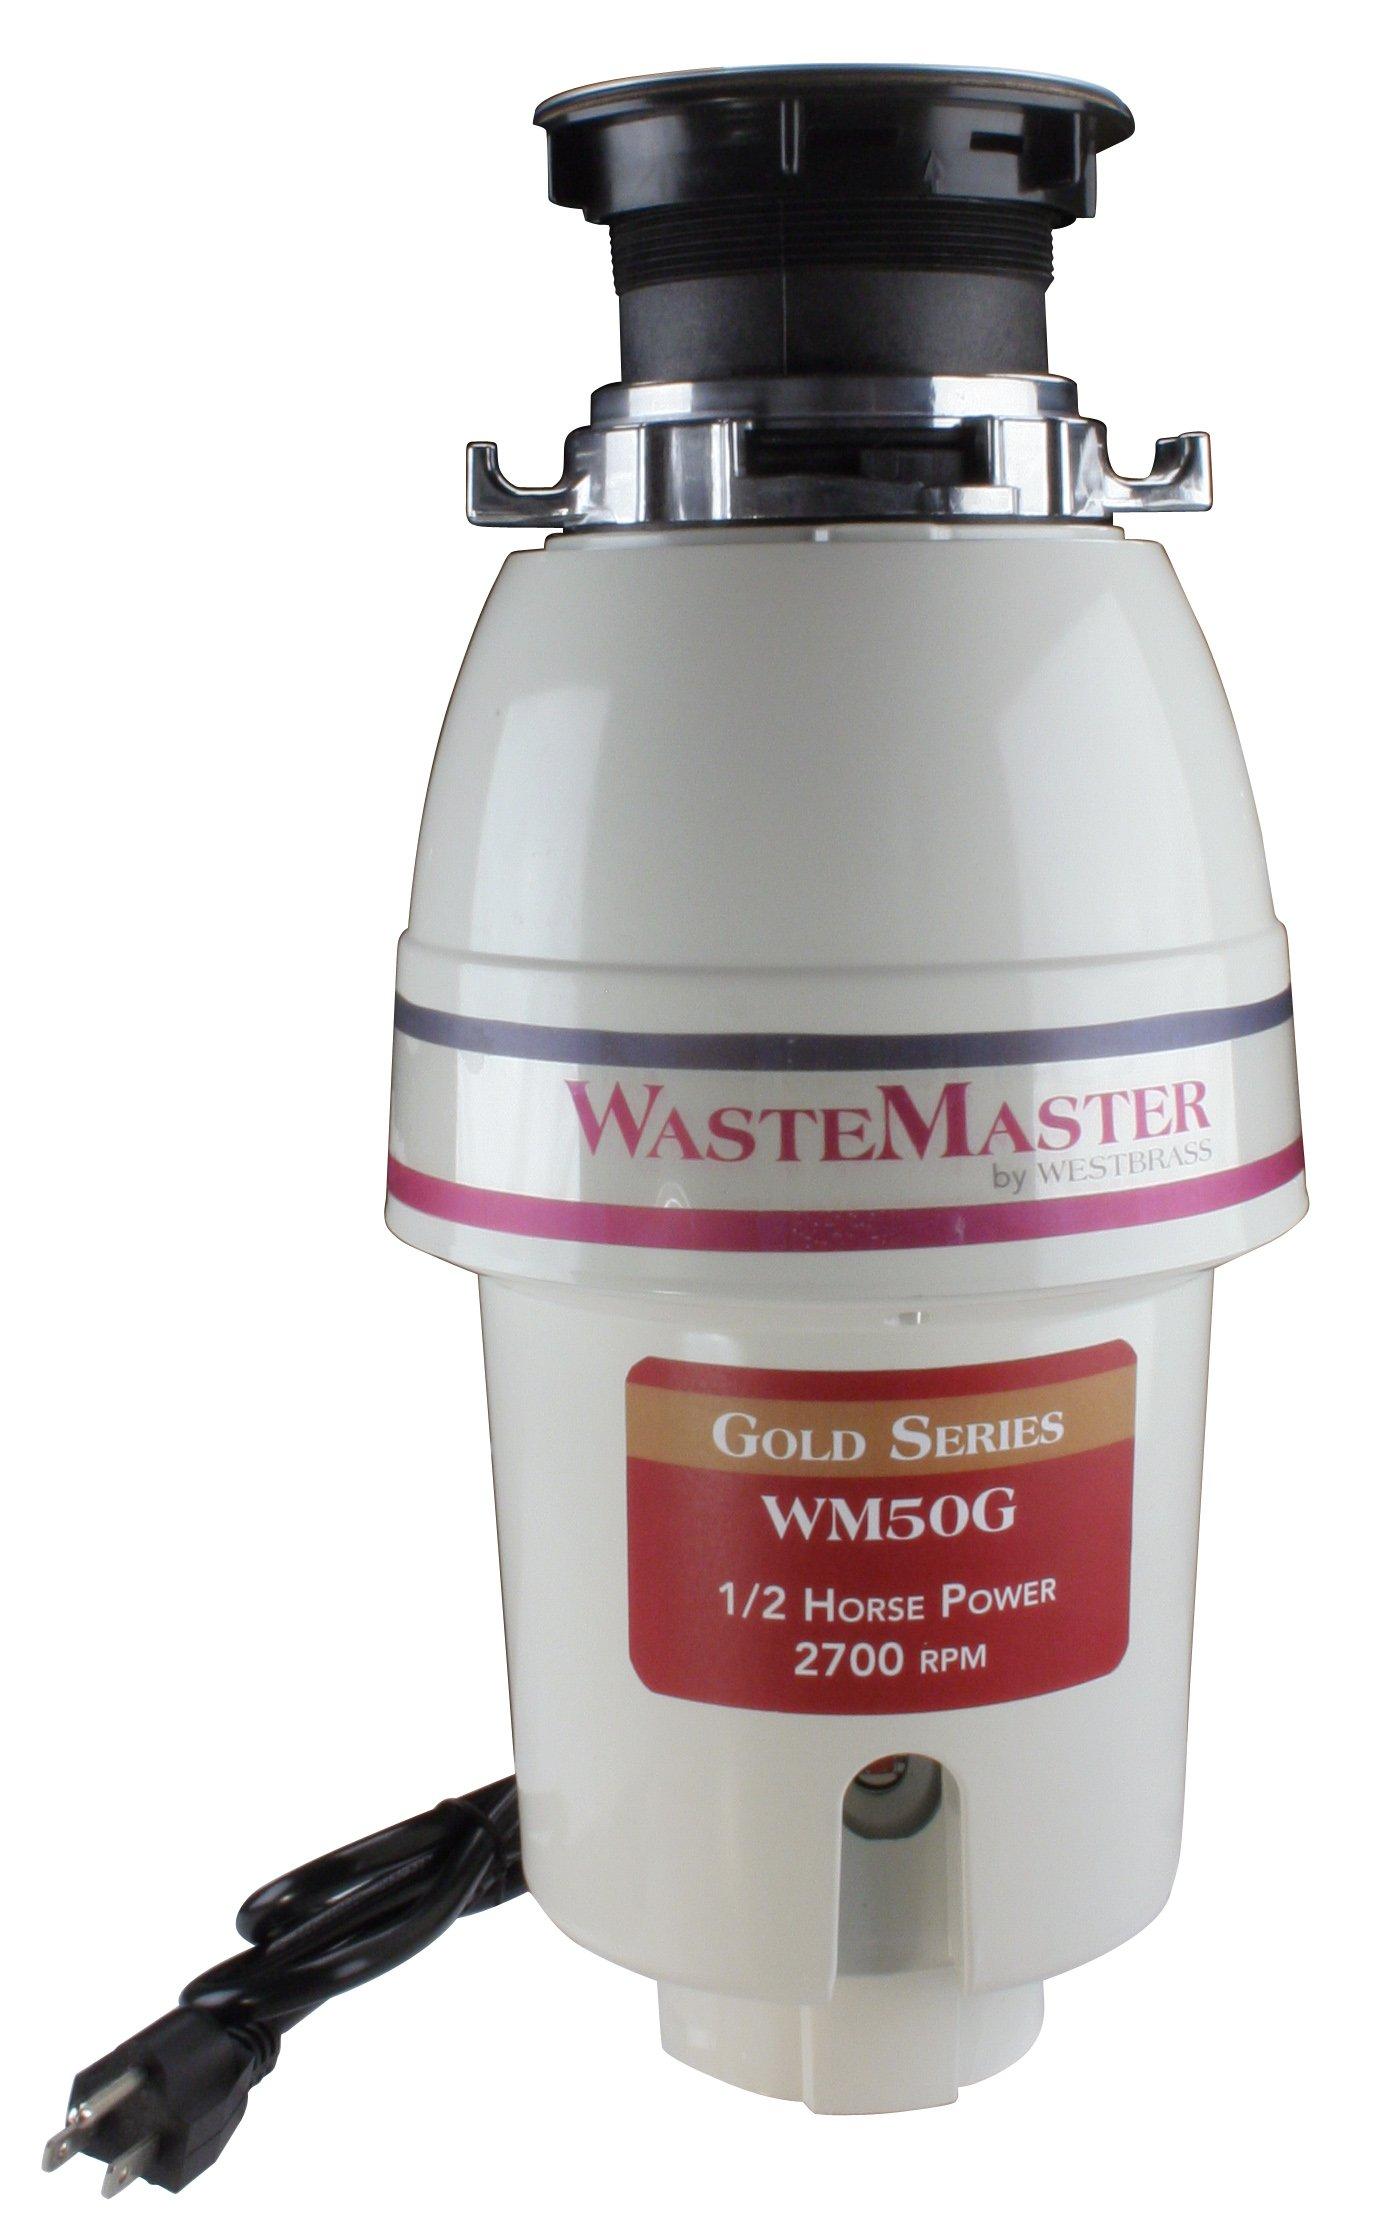 WasteMaster WM50G 1/2 HP Gold Series Continuous Speed Waste Disposer